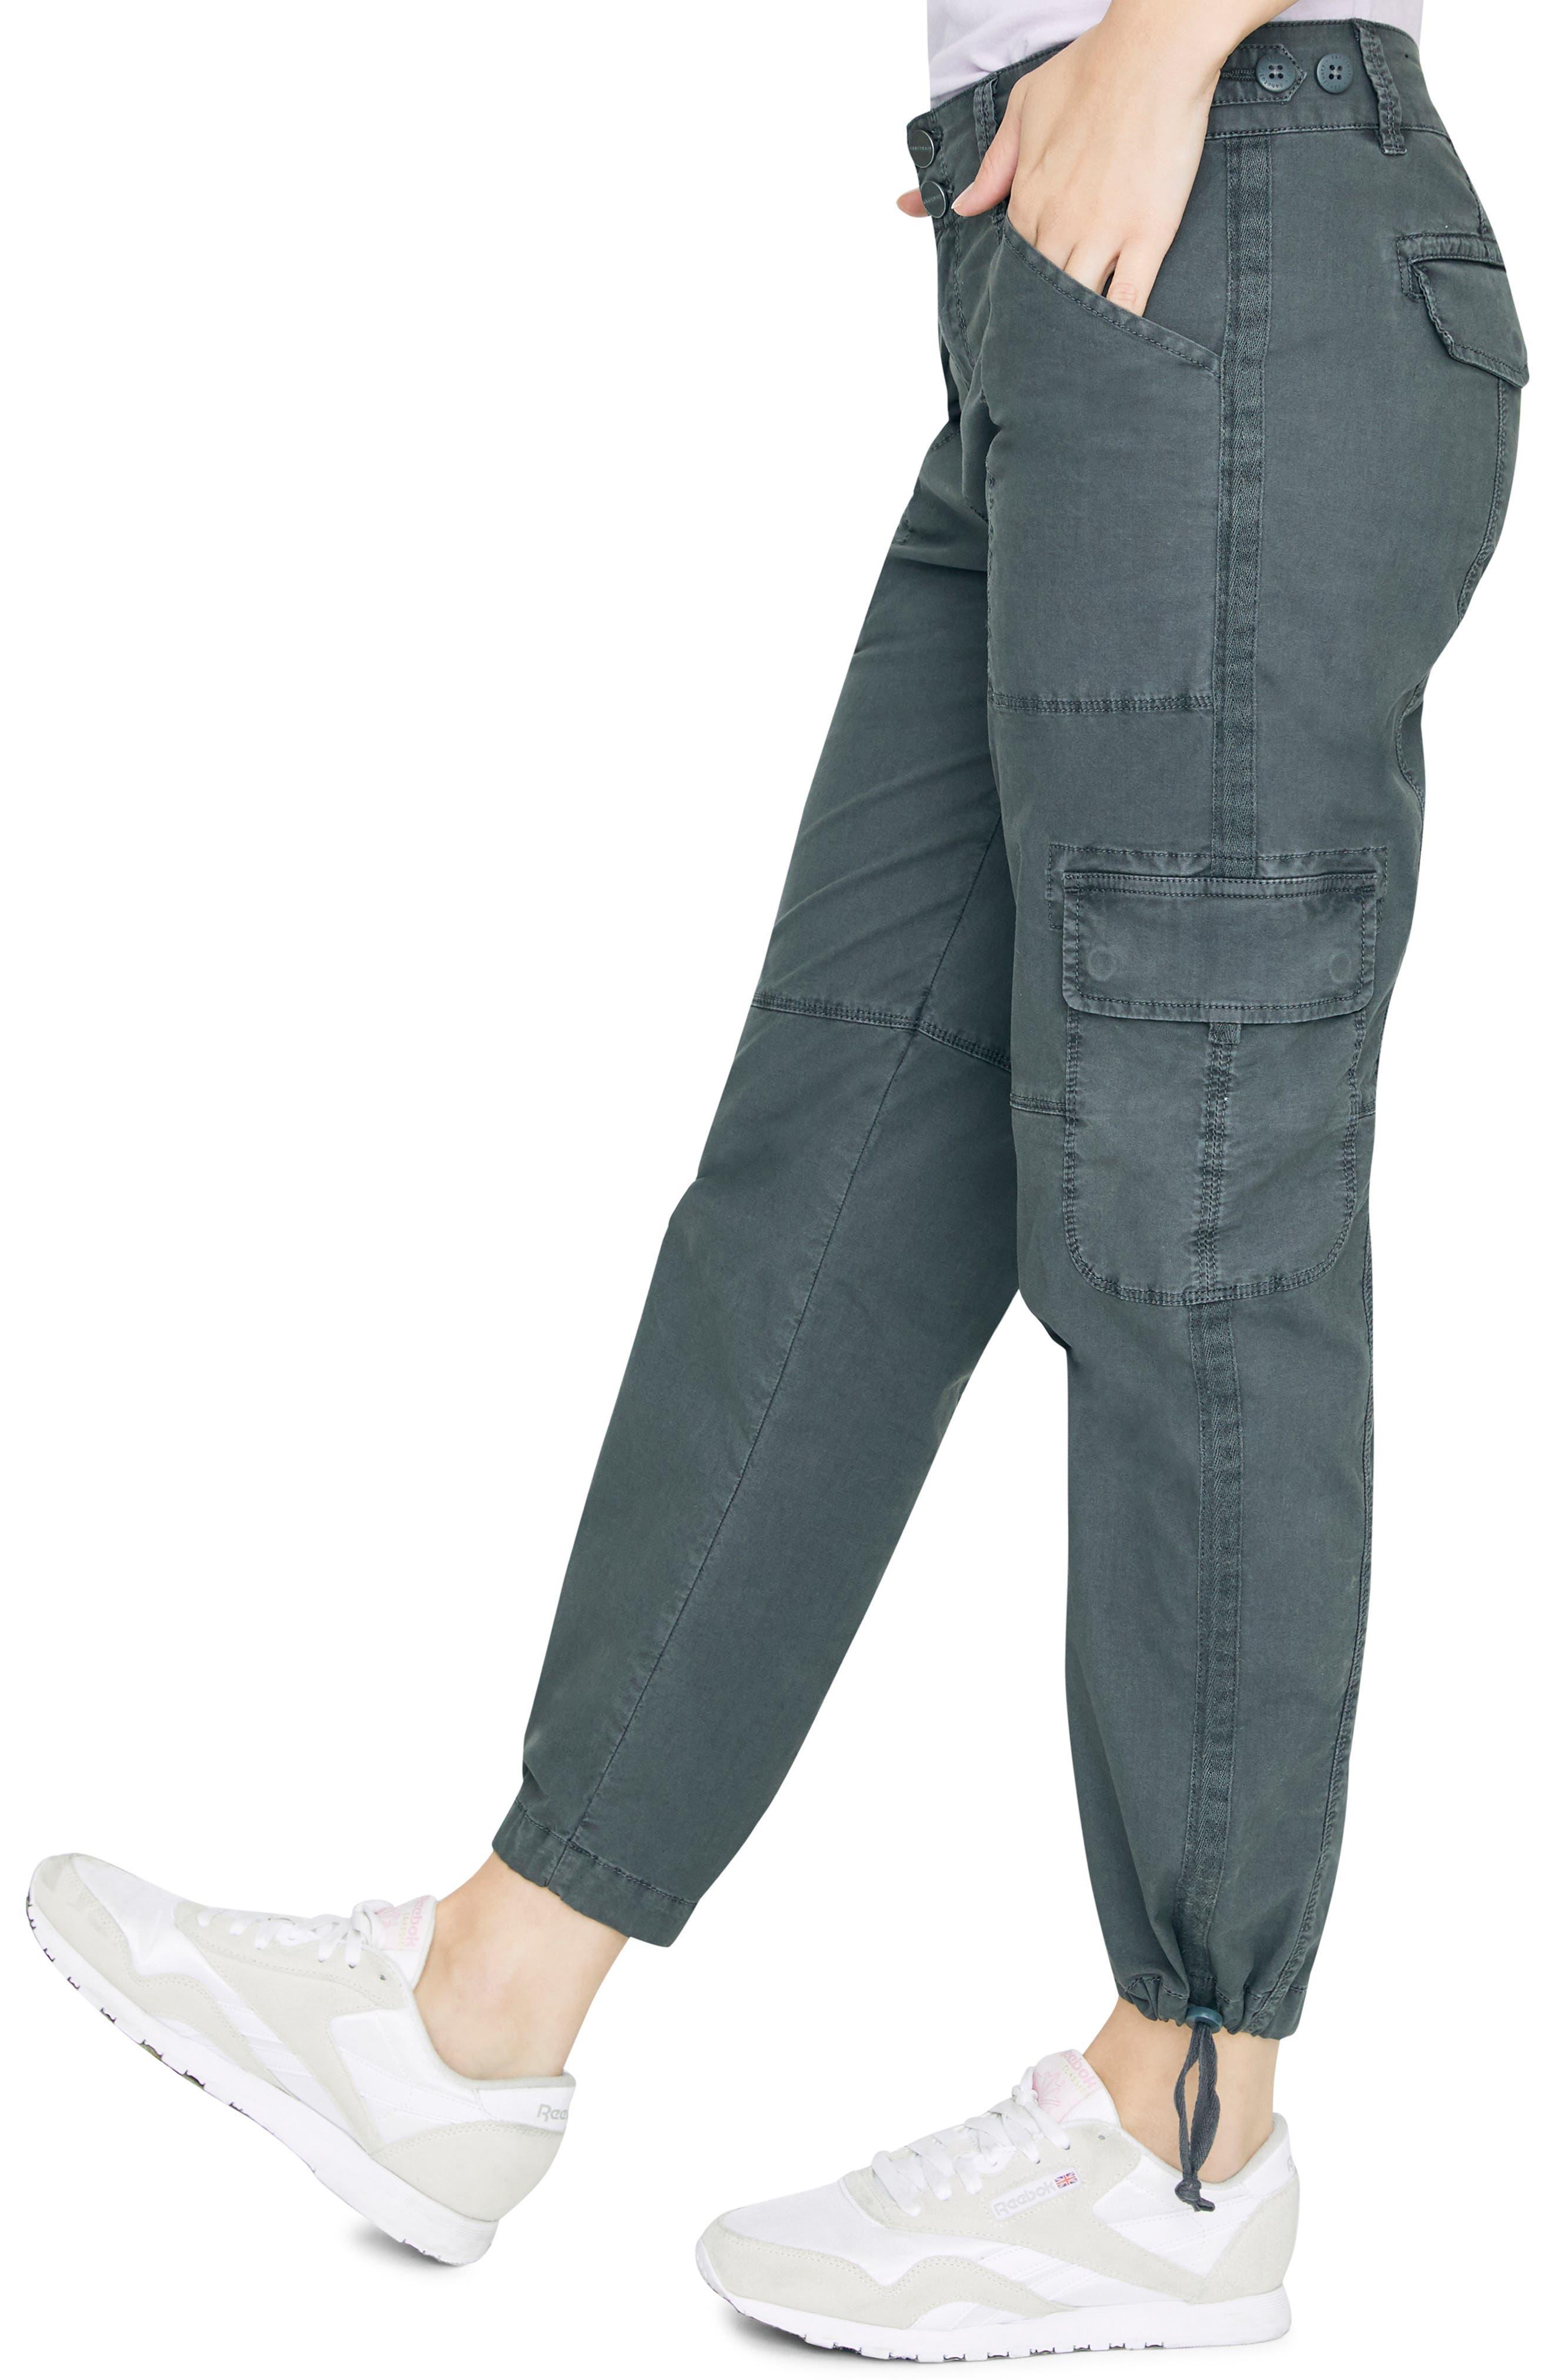 SANCTUARY, Terrain Crop Cargo Pants, Alternate thumbnail 4, color, WASHED FADED BLACK